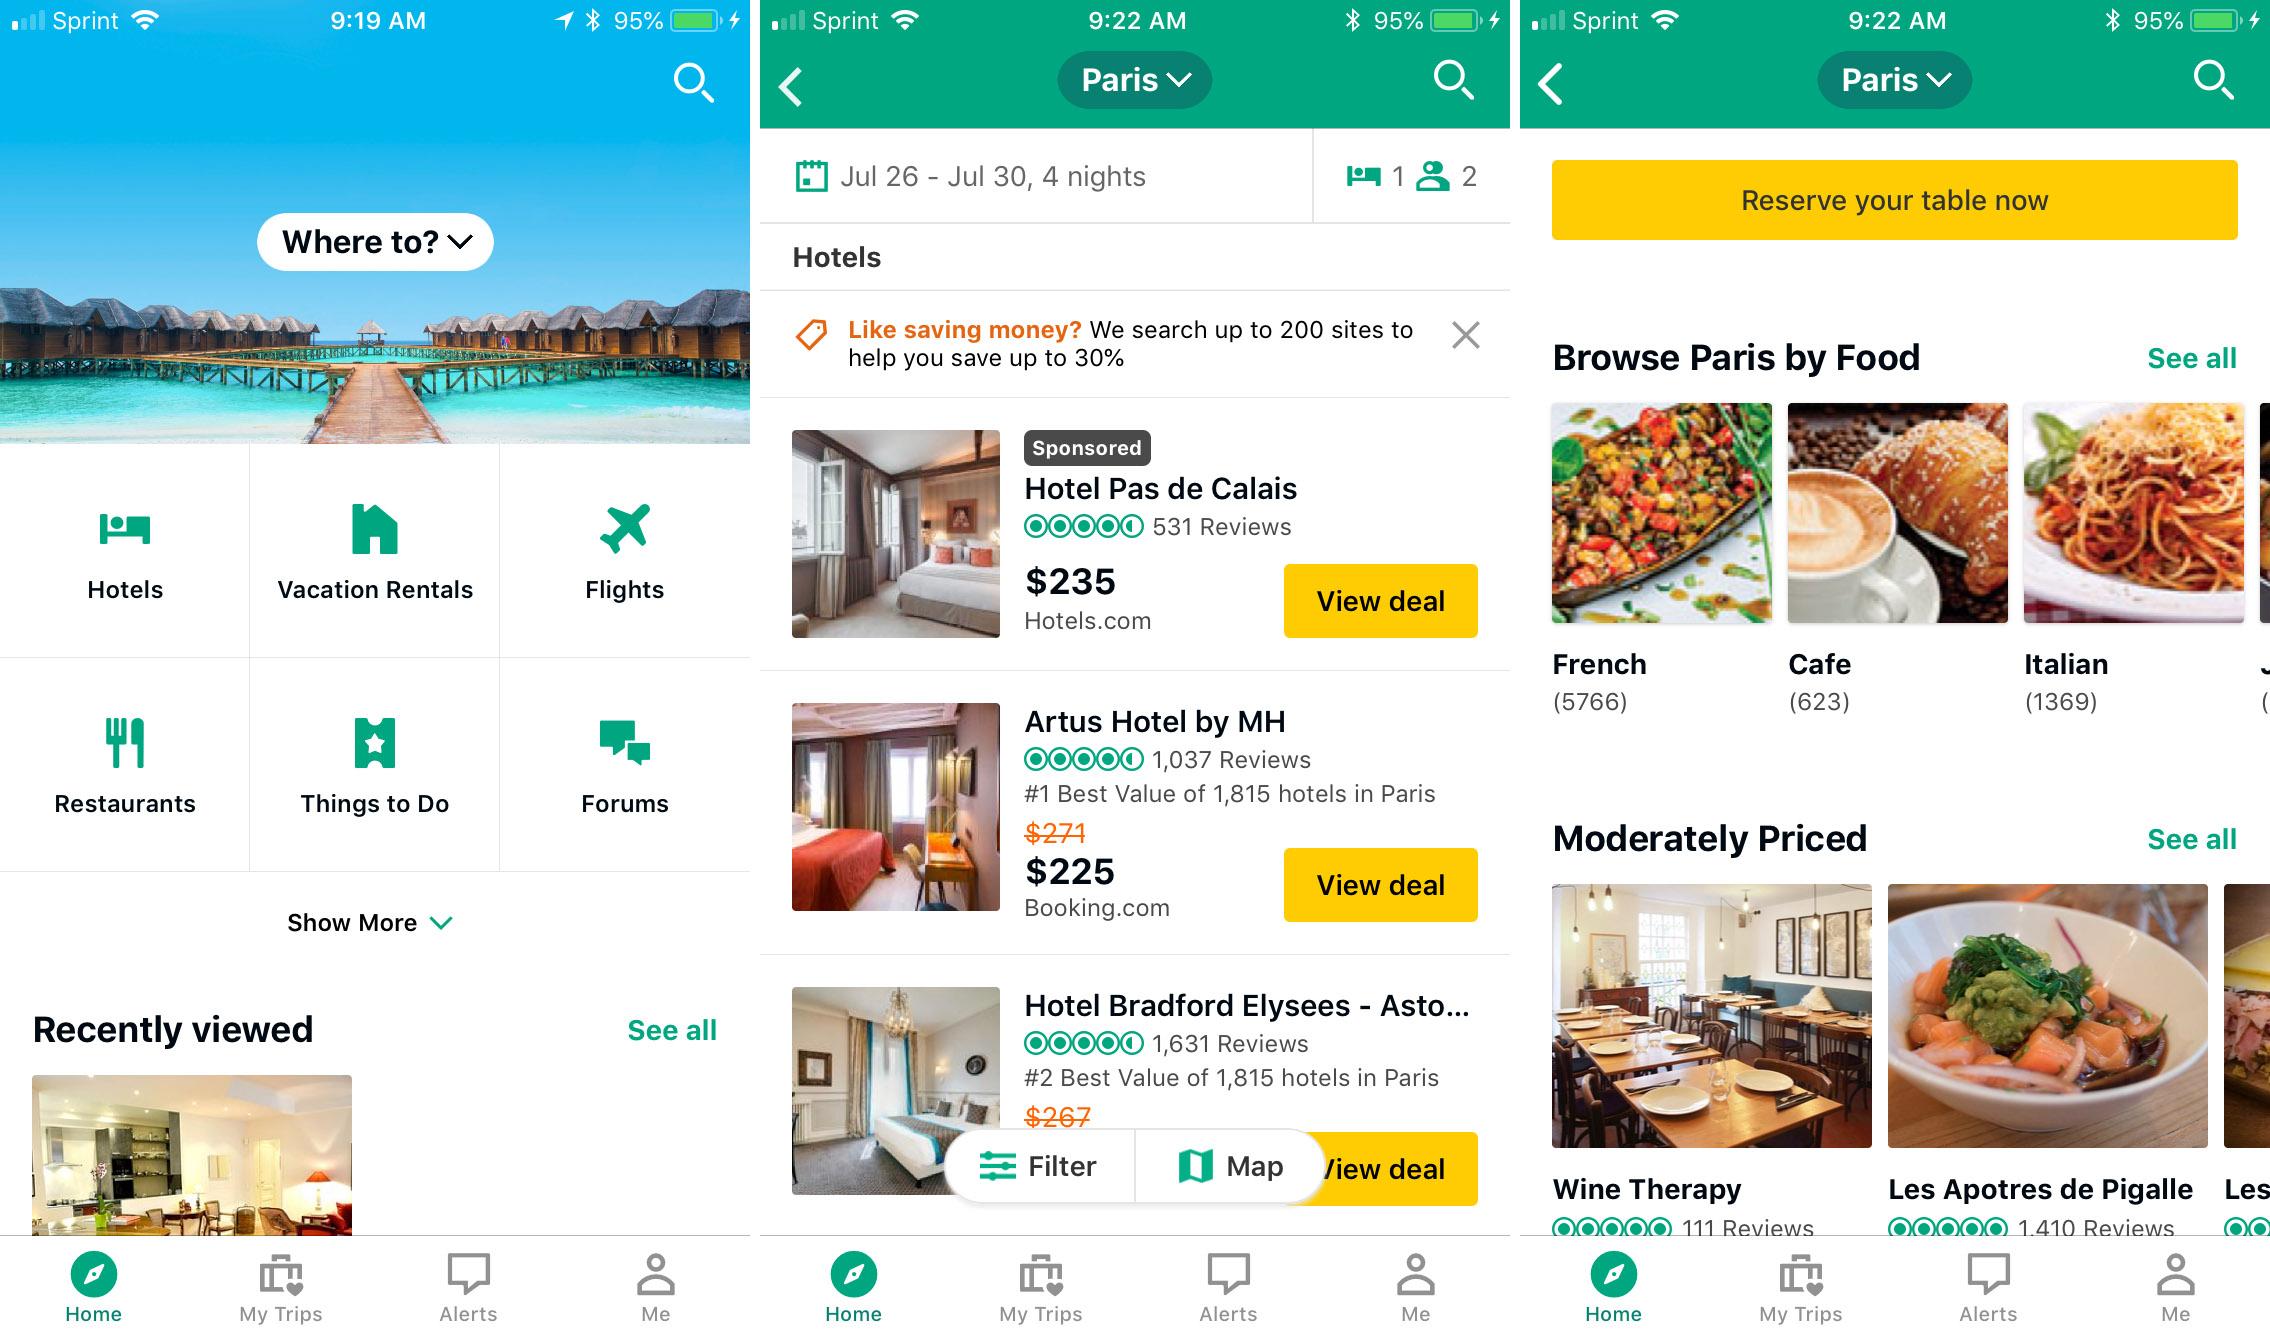 Aplicación de viaje de TripAdvisor iphone